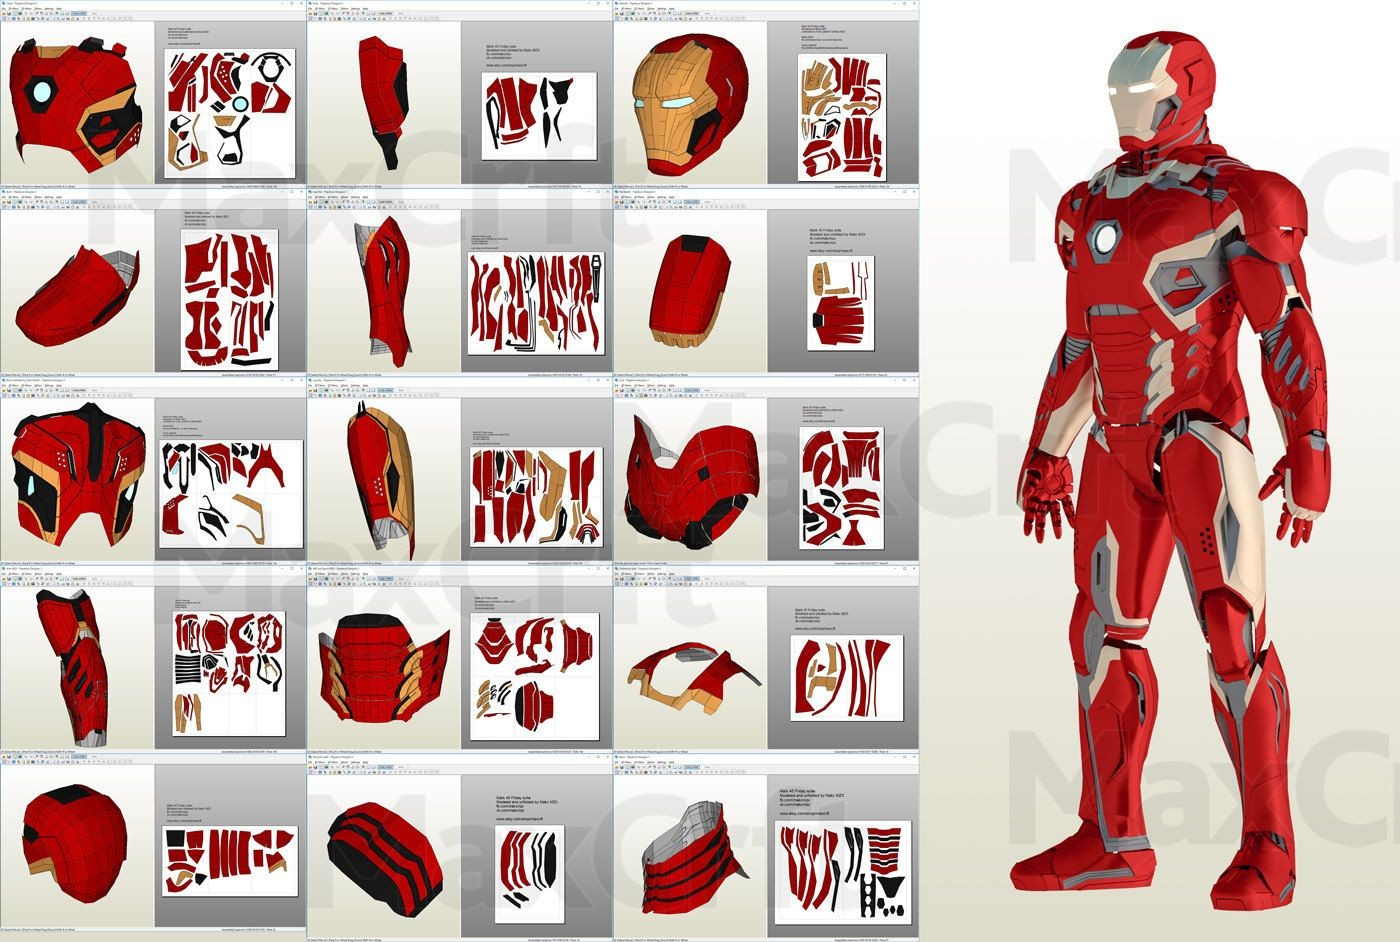 Deadpool Papercraft Mark 48 Wearable Suit Upd 9 Pepakura Pattern Diy May 17 2018